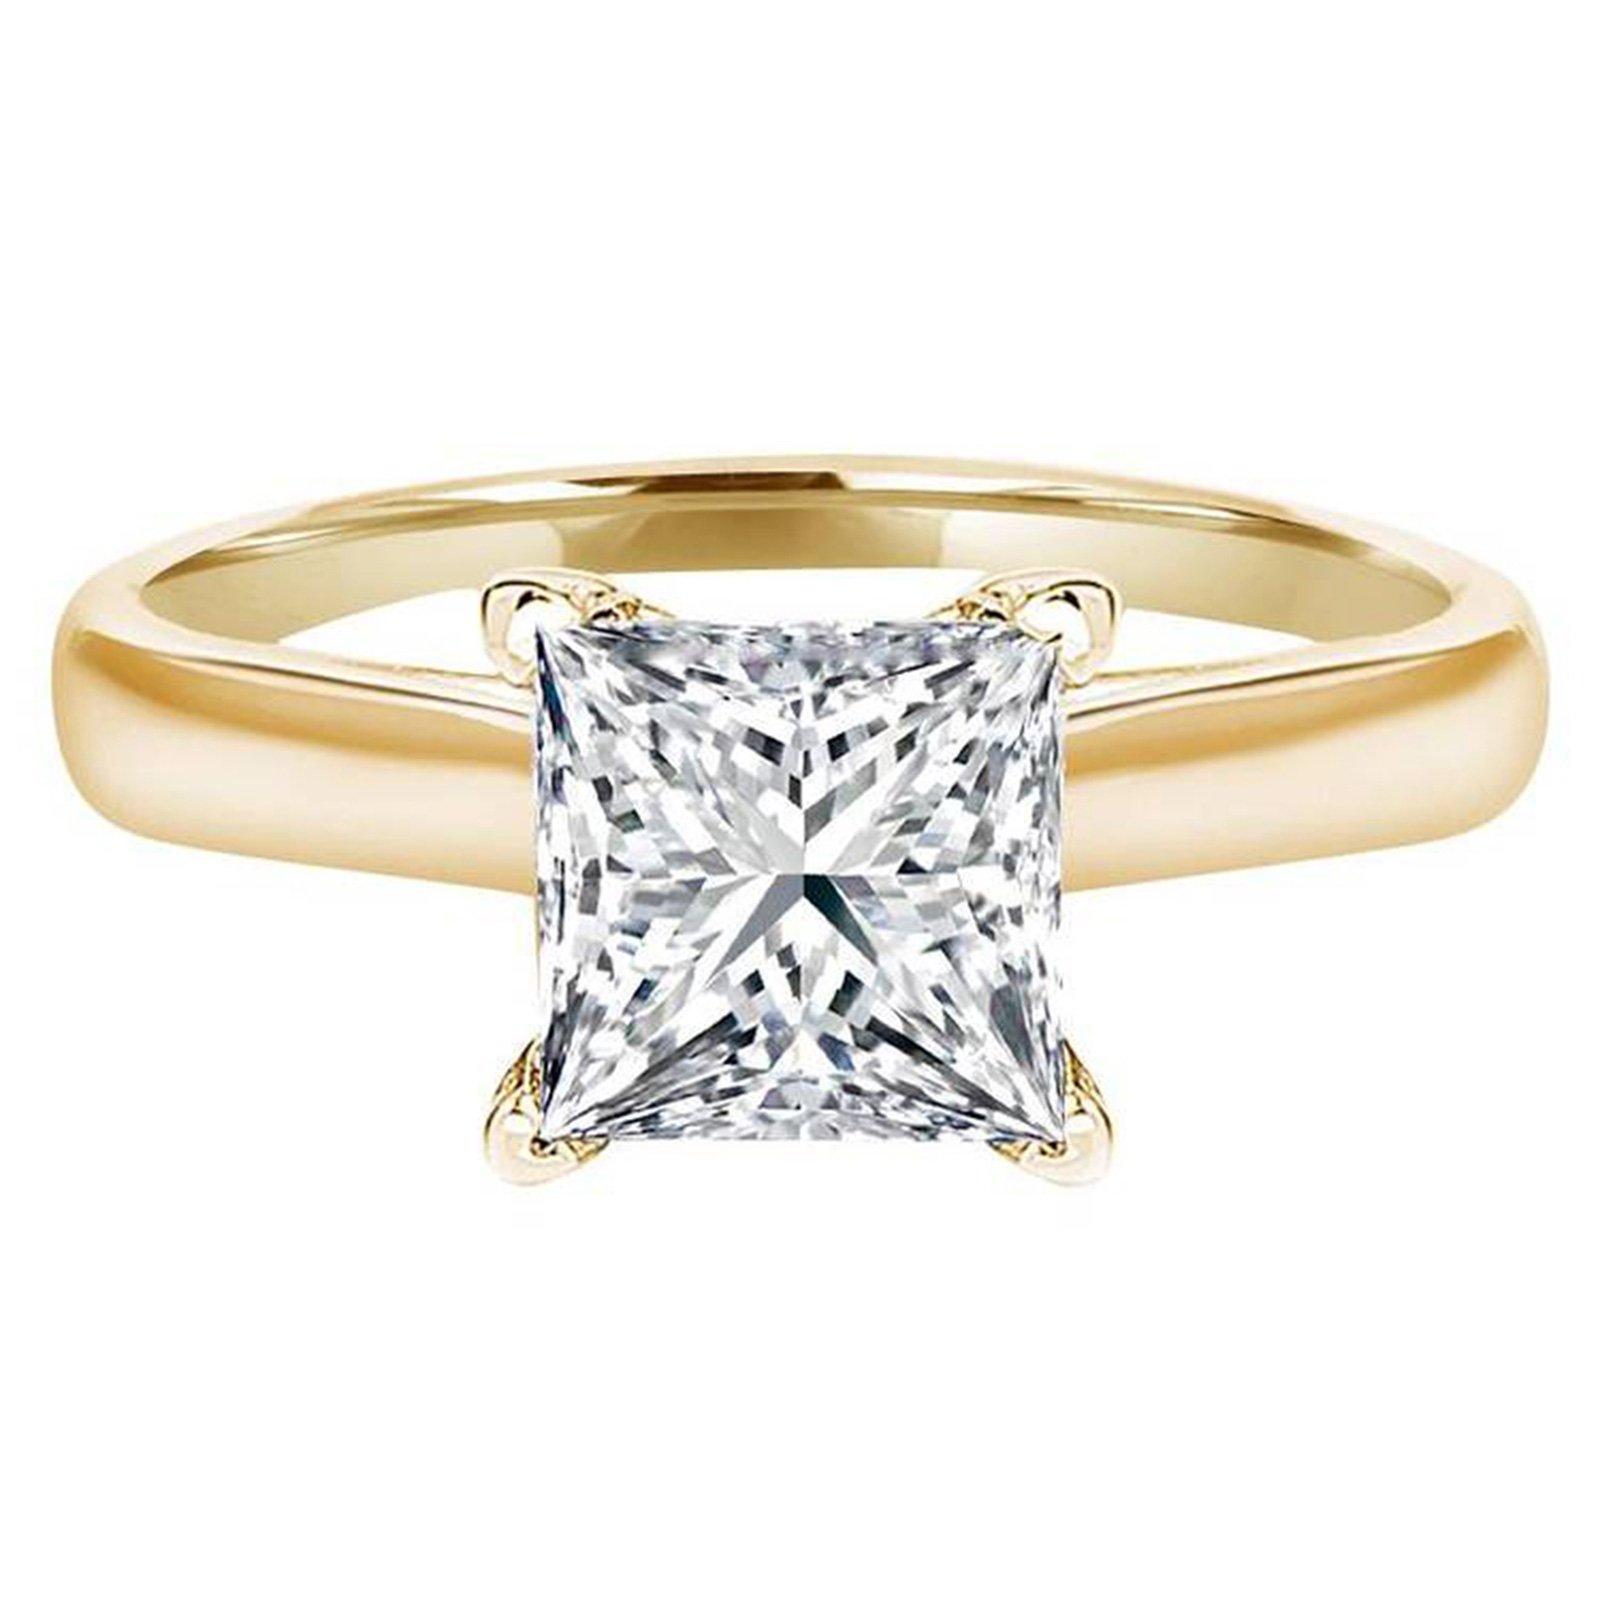 0.7 Ct Princess Brilliant Cut Solitaire Engagement Wedding Bridal Anniversary Ring 14K Yellow Gold, Size 9, Clara Pucci